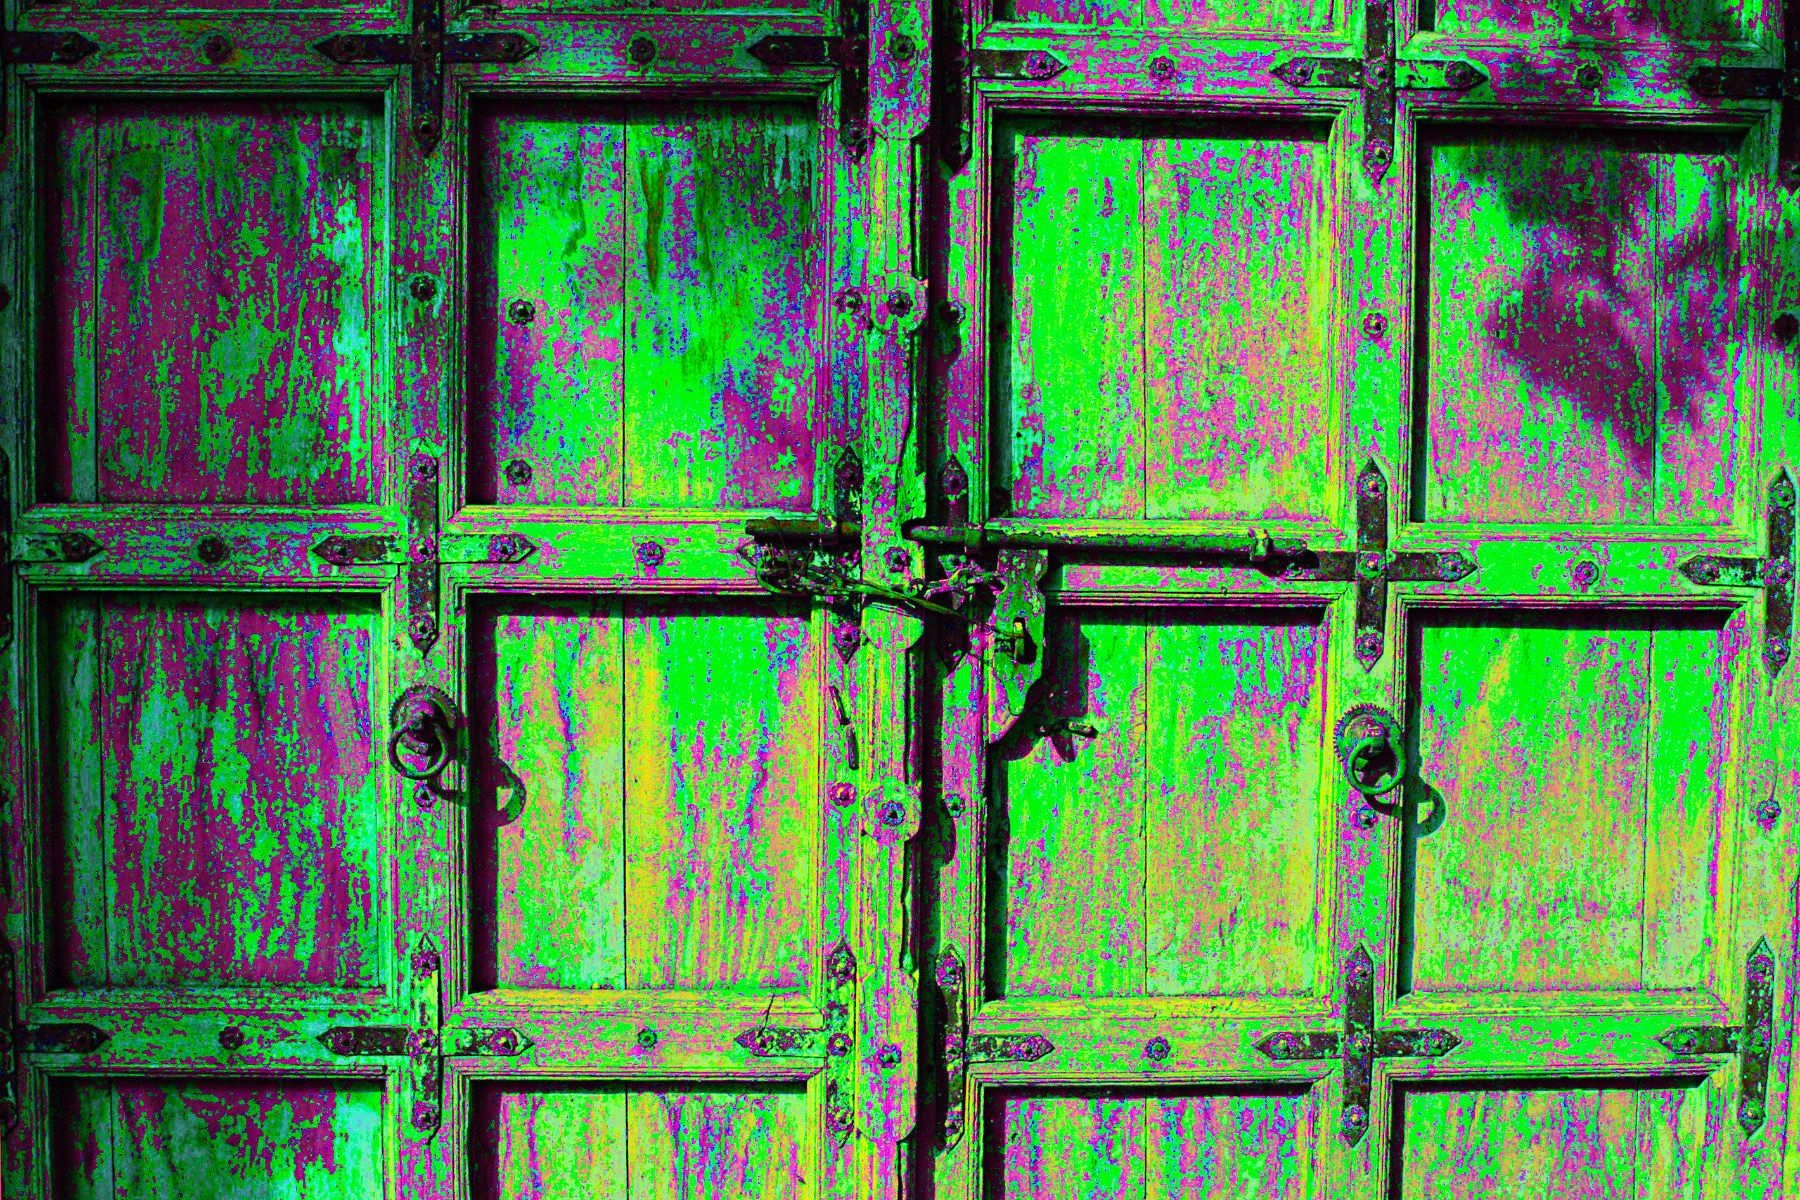 26_0_20_1c_gottlieb_jane_nm_doors_.jpg